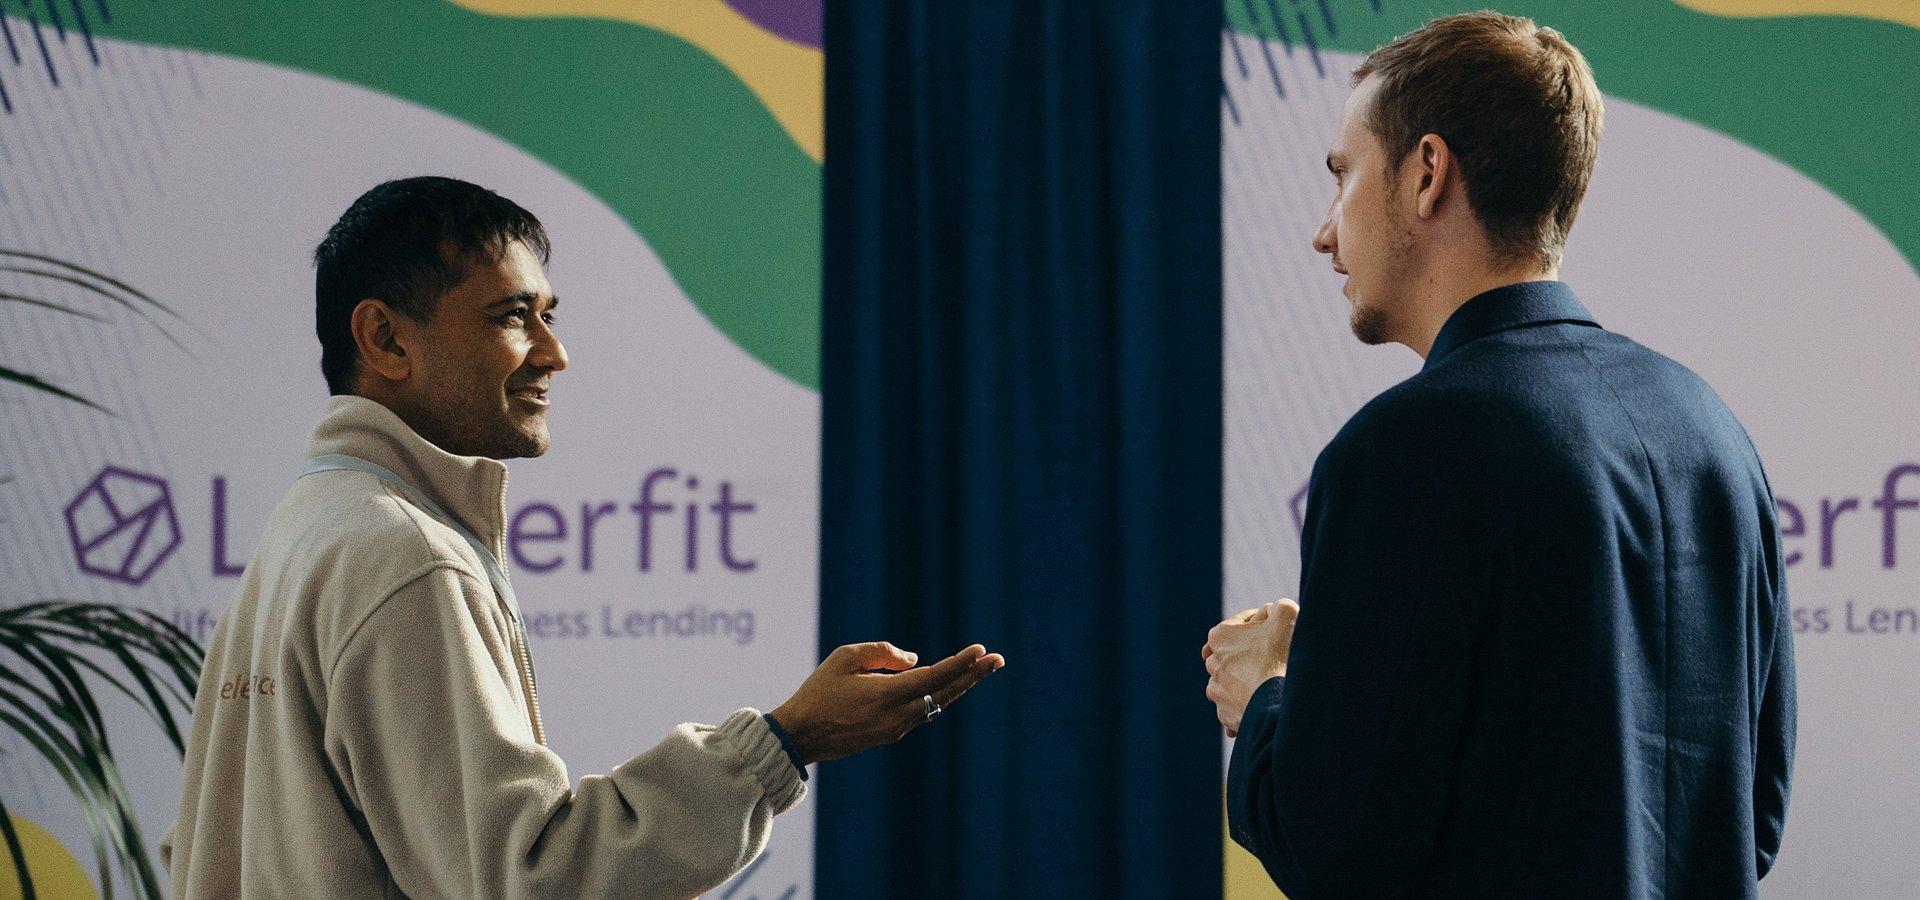 Access Ventures Begins Development of Lenderfit